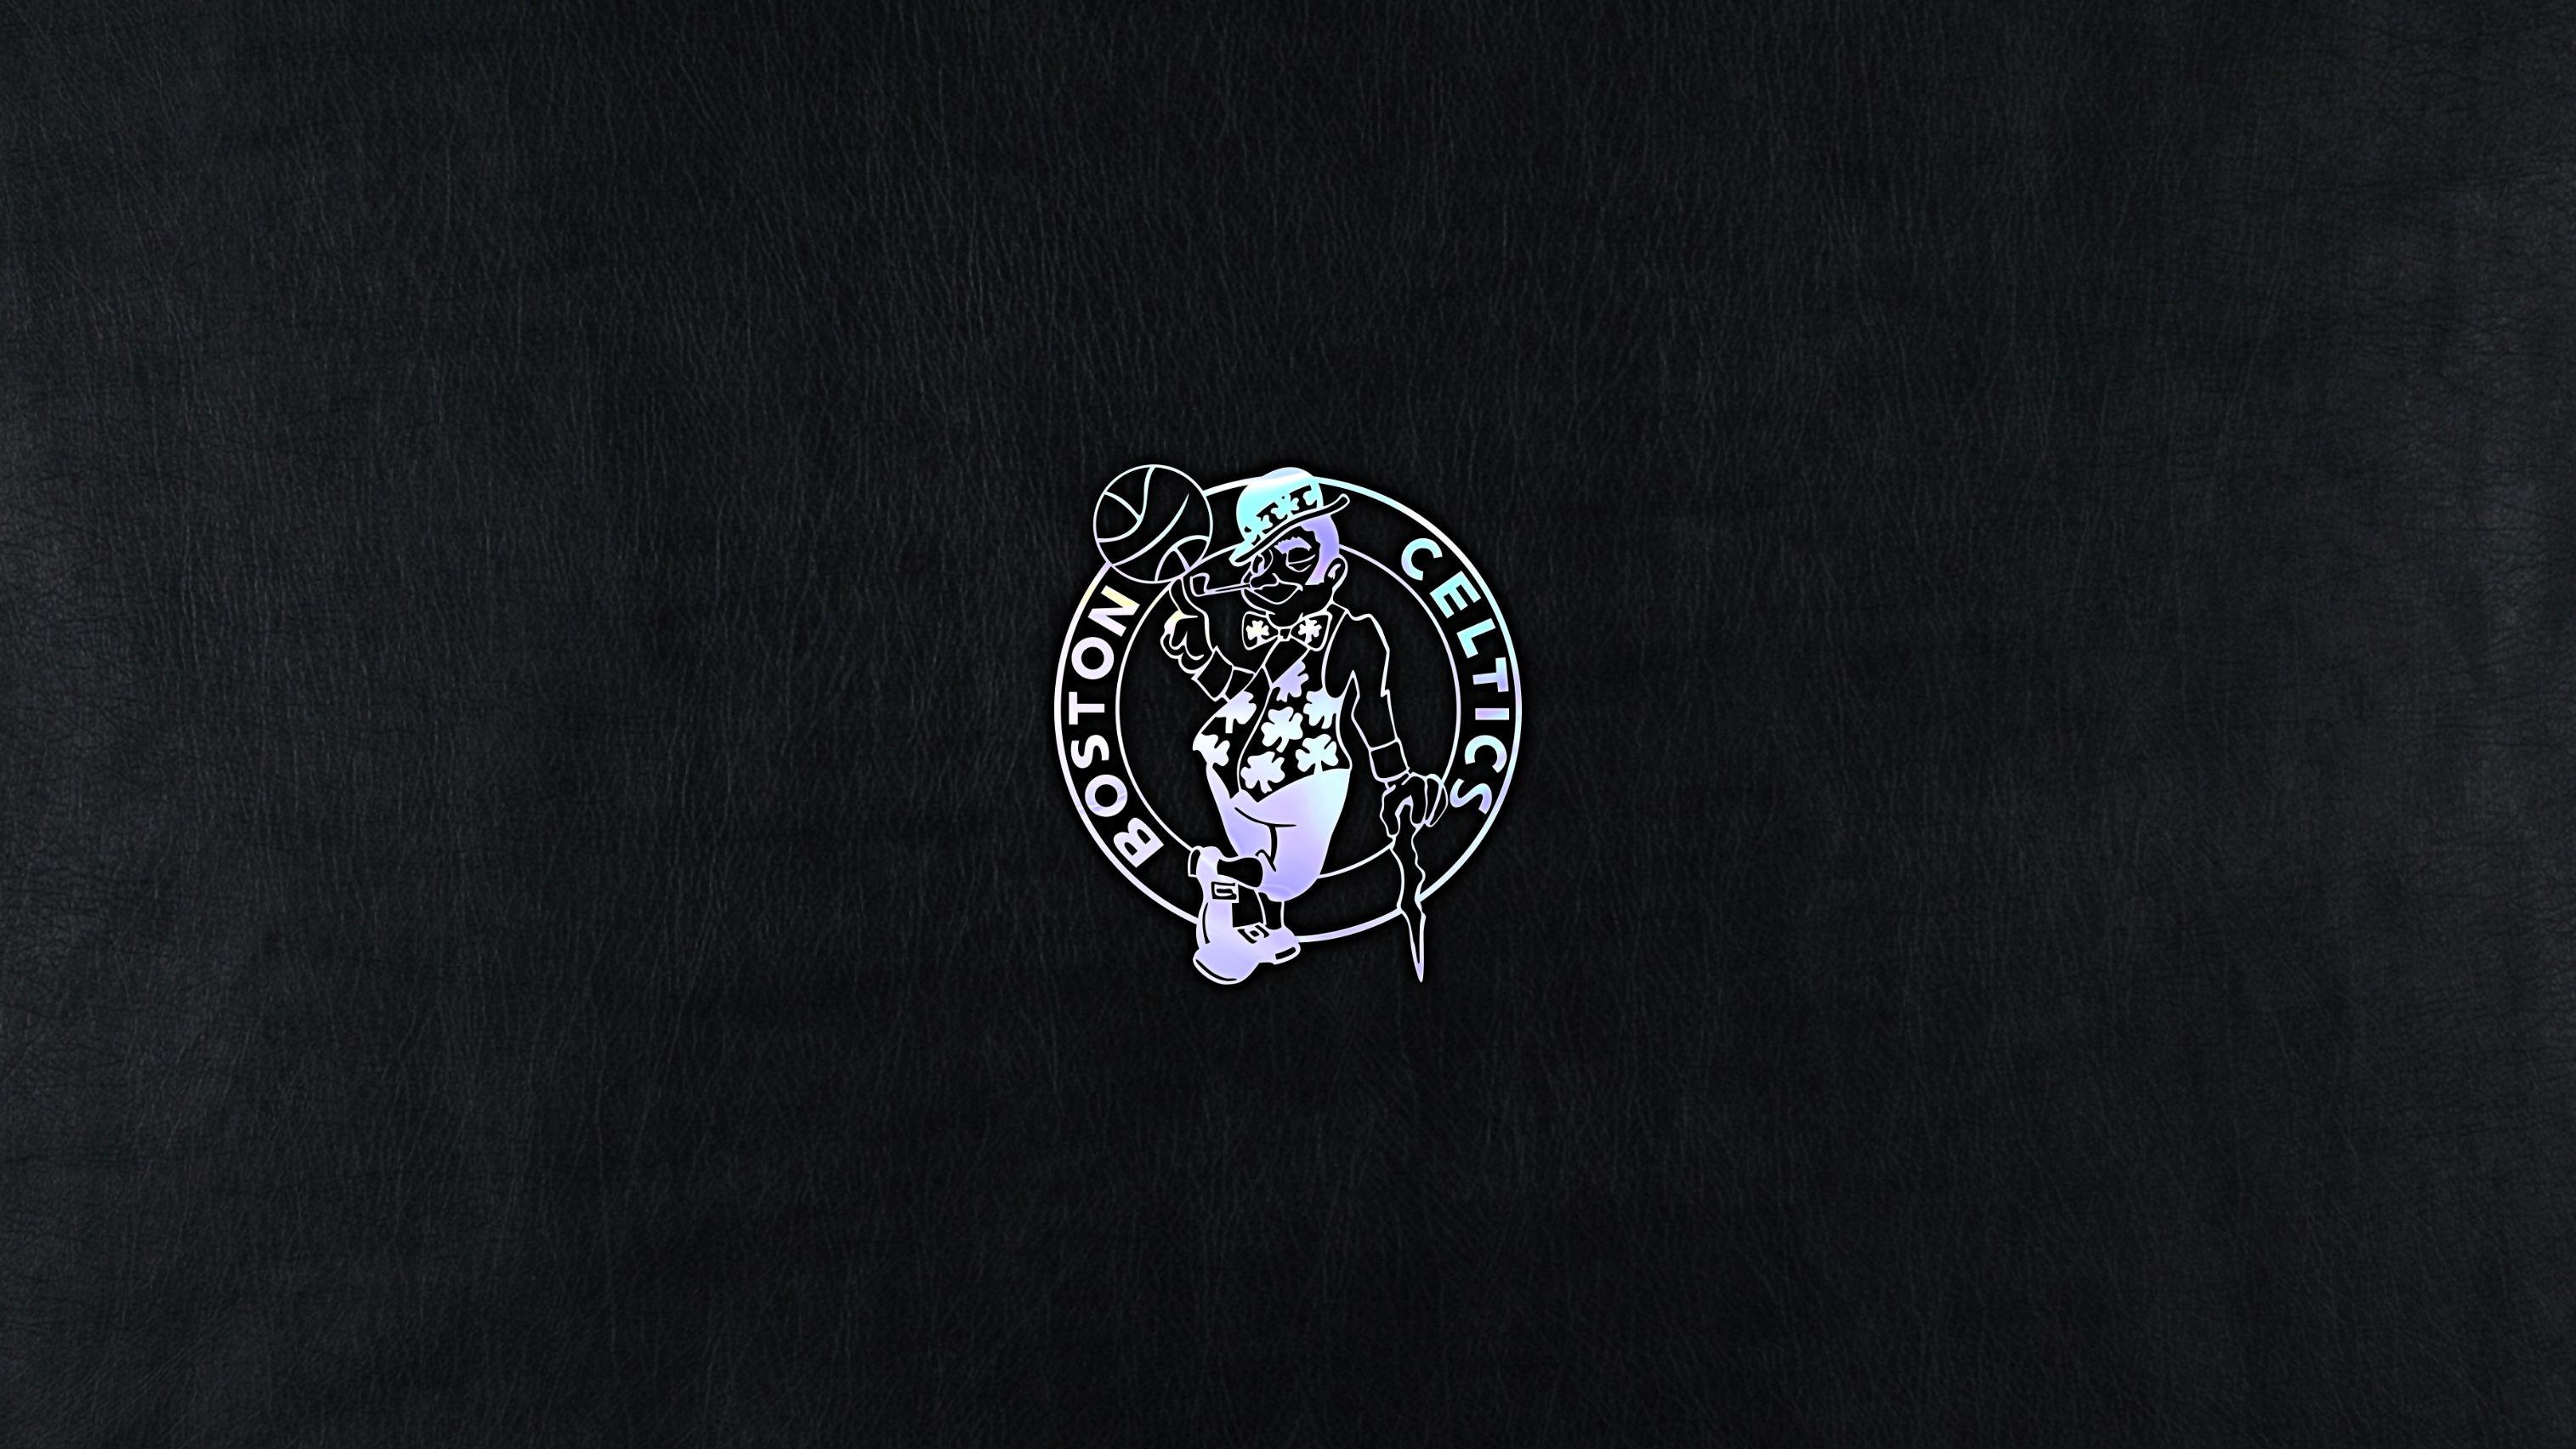 Boston Celtics Desktop Background In 2020 Nba Background Boston Celtics Wallpaper Backgrounds Desktop